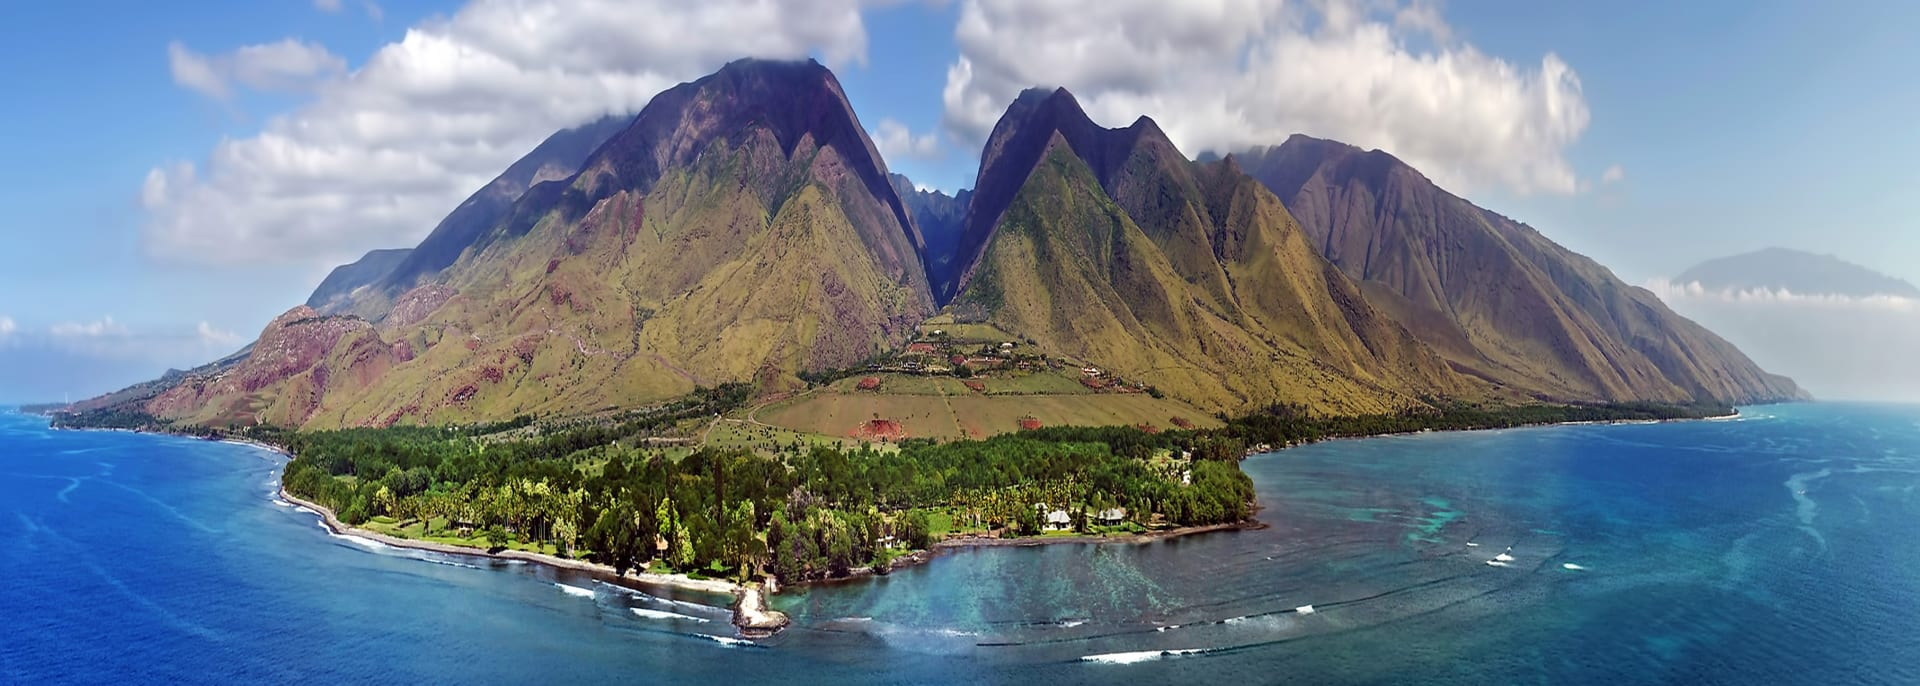 Maui Reisen, Hawaii, USA